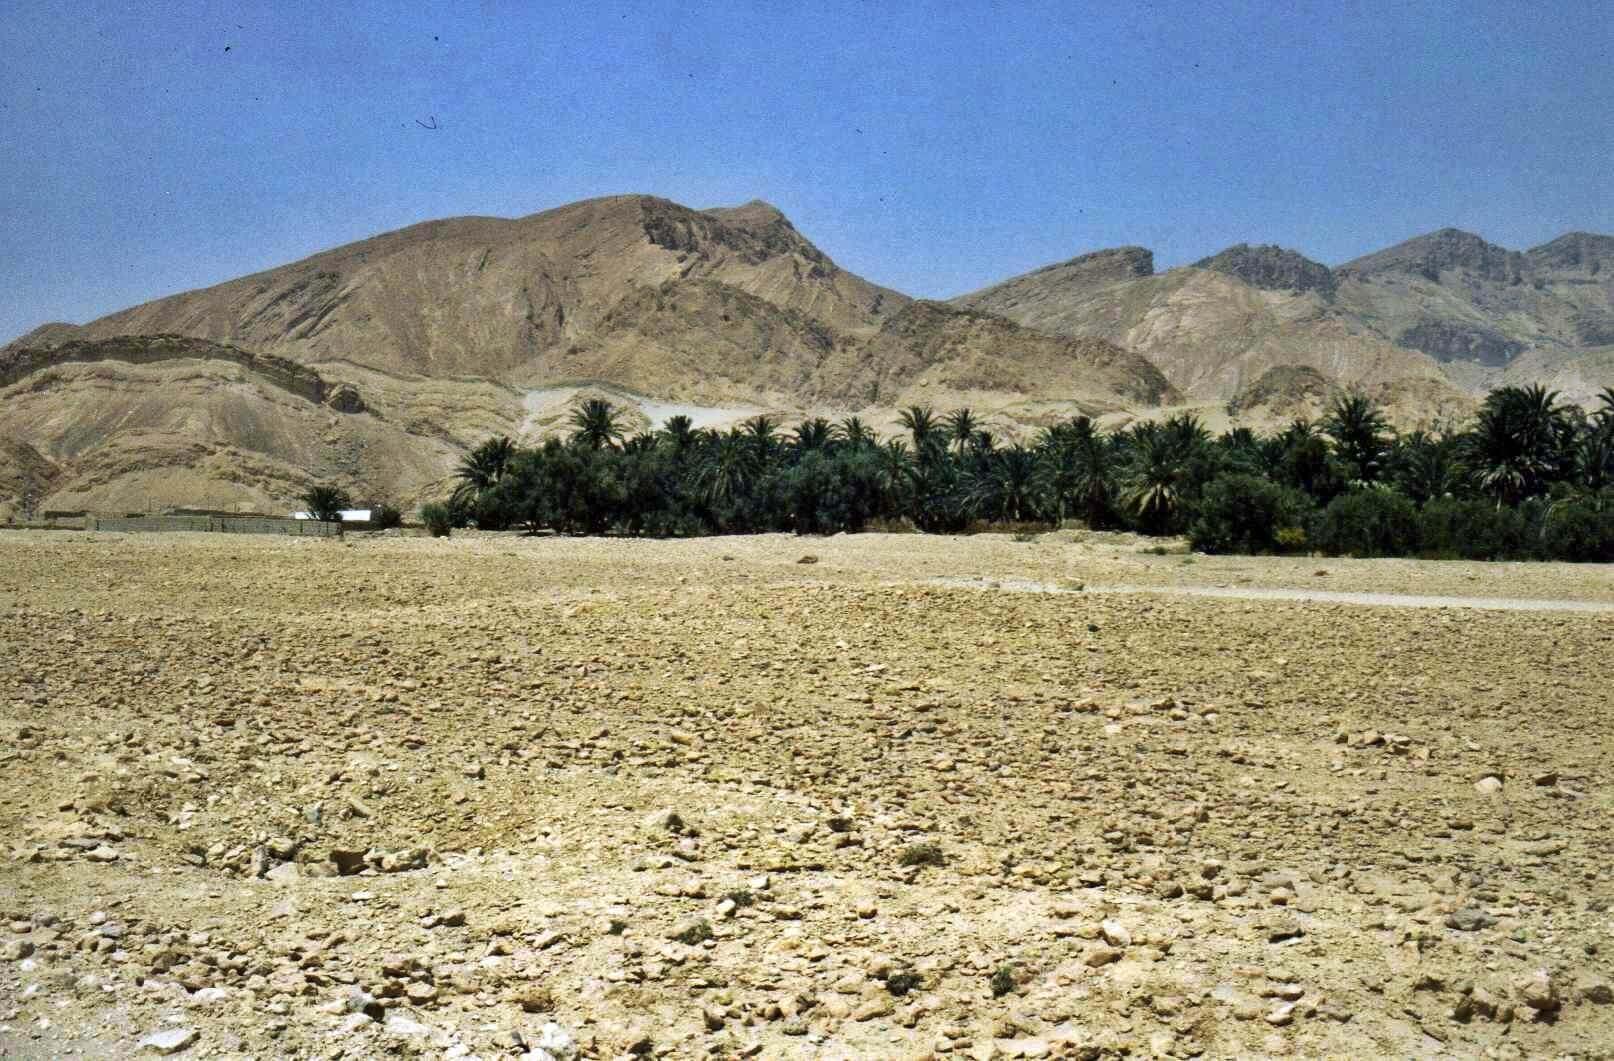 Raid moto 4x4 Tunisie Wild Spot Chebika Gafsa région Moularès